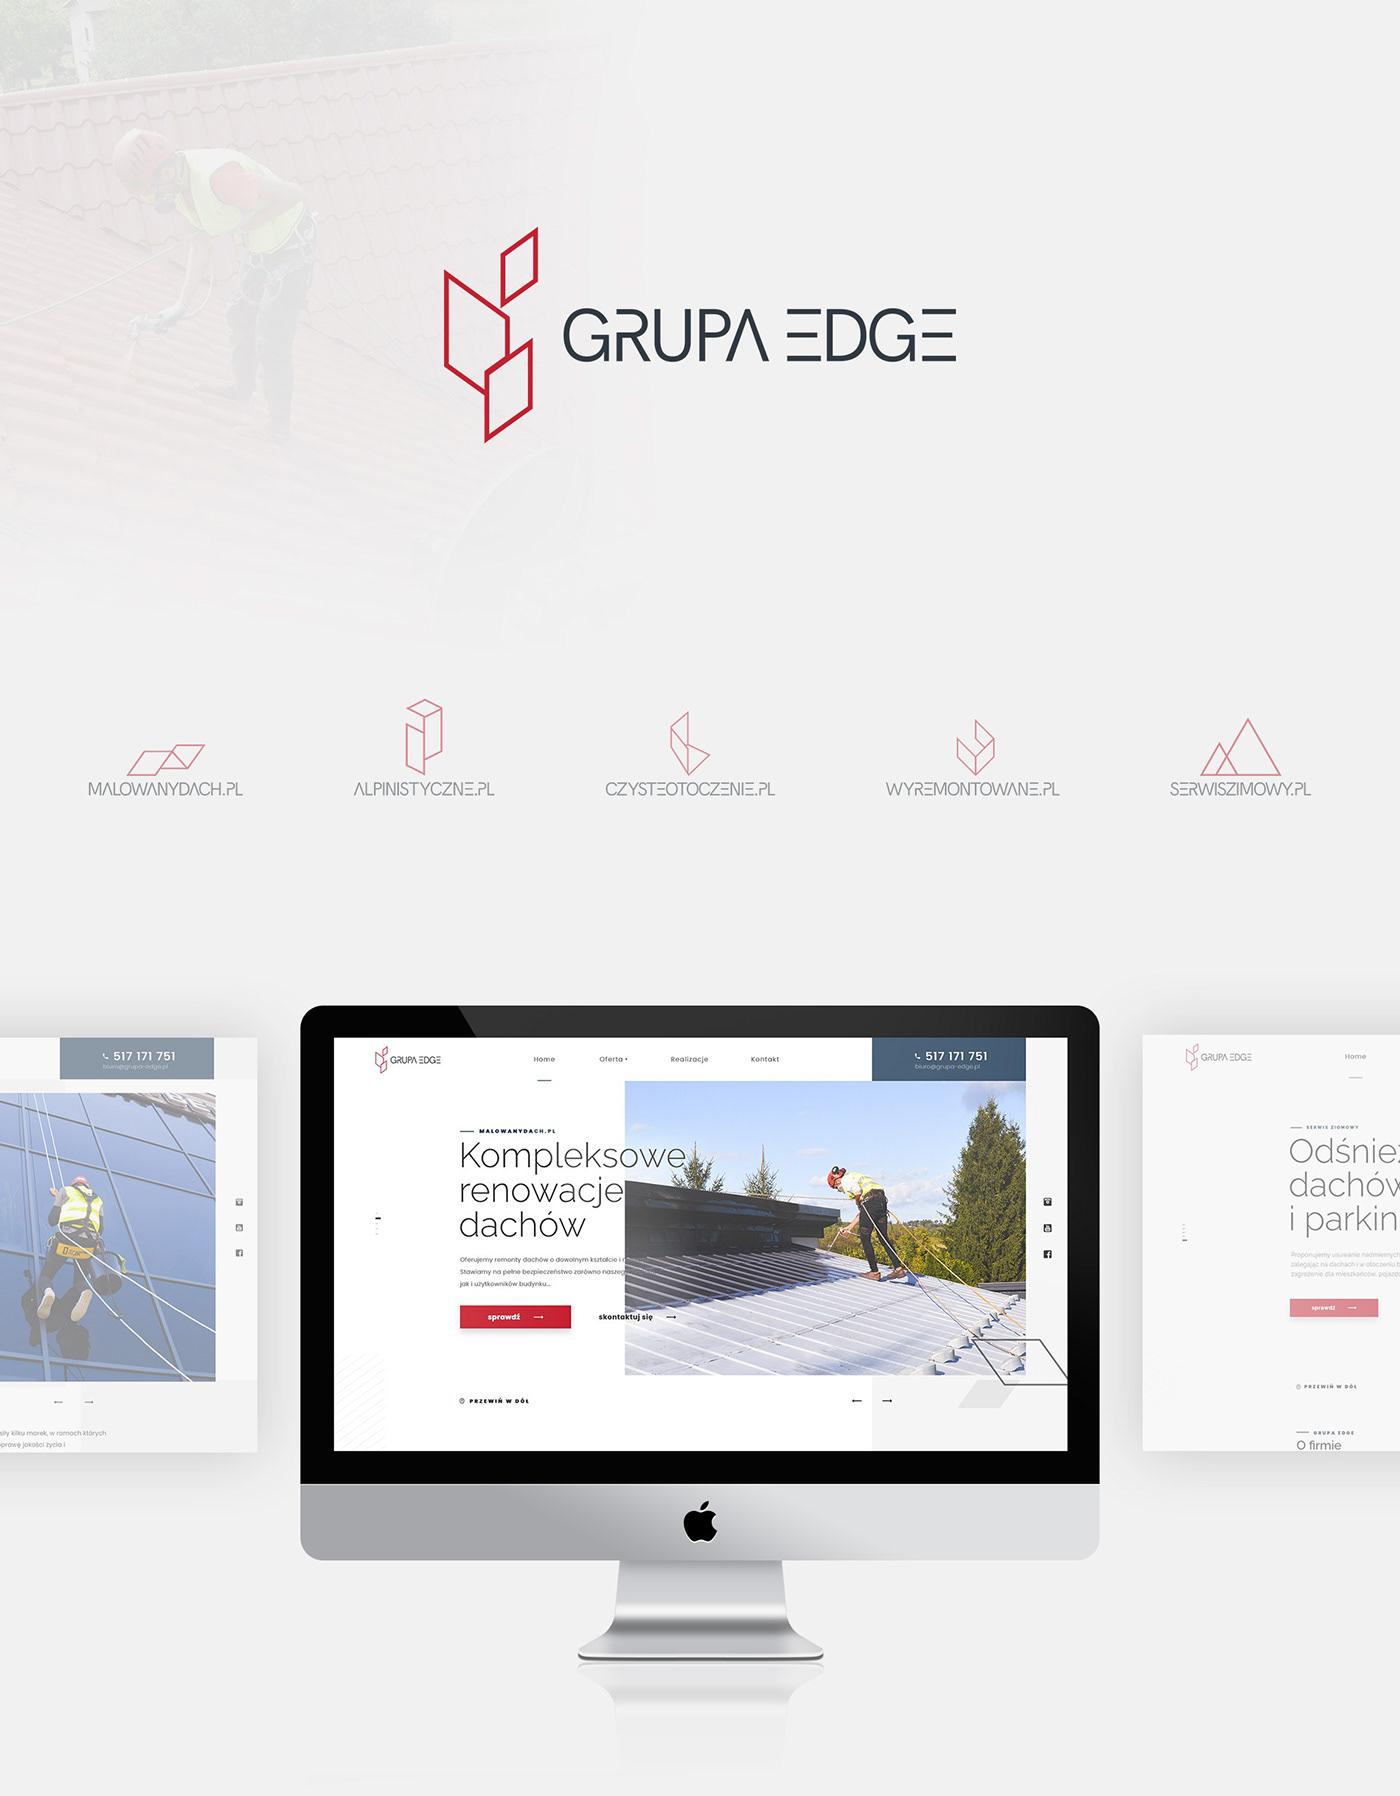 catalog,construction,folder,renovation,UI,UI/UX,ux,Web,Web Design